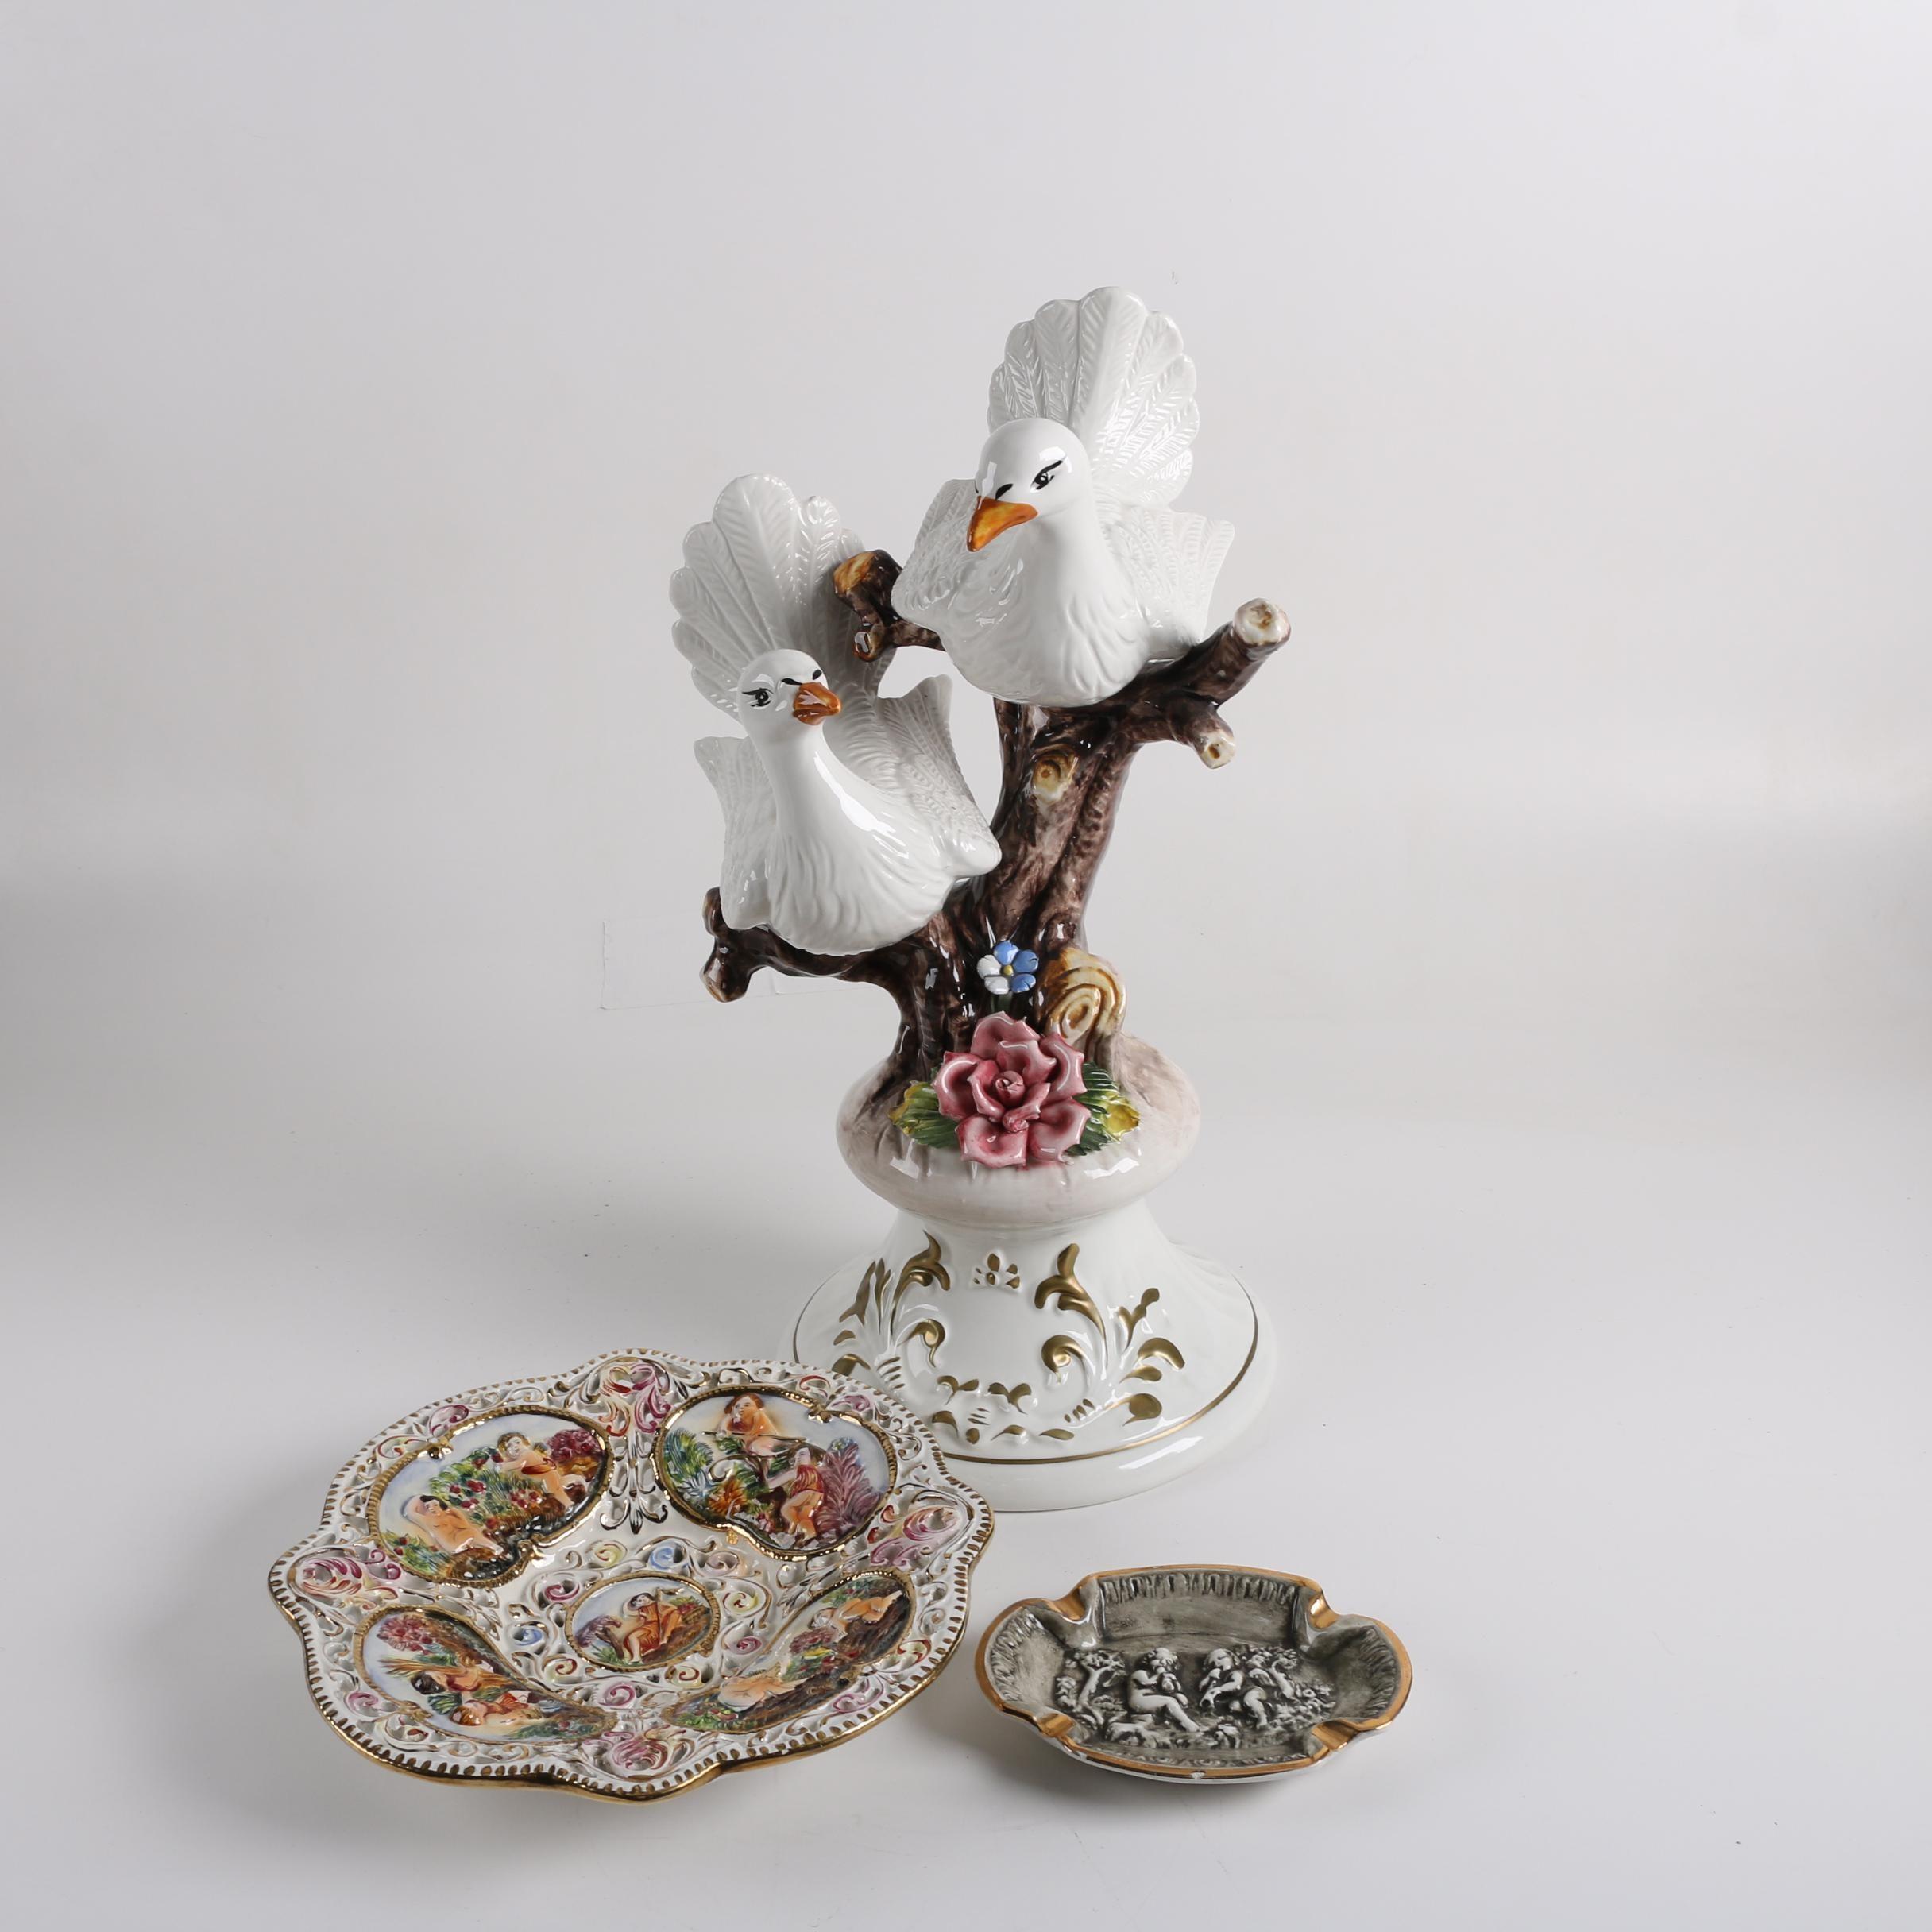 Capodimonte-Style Earthenware Doves Figurine and Trays